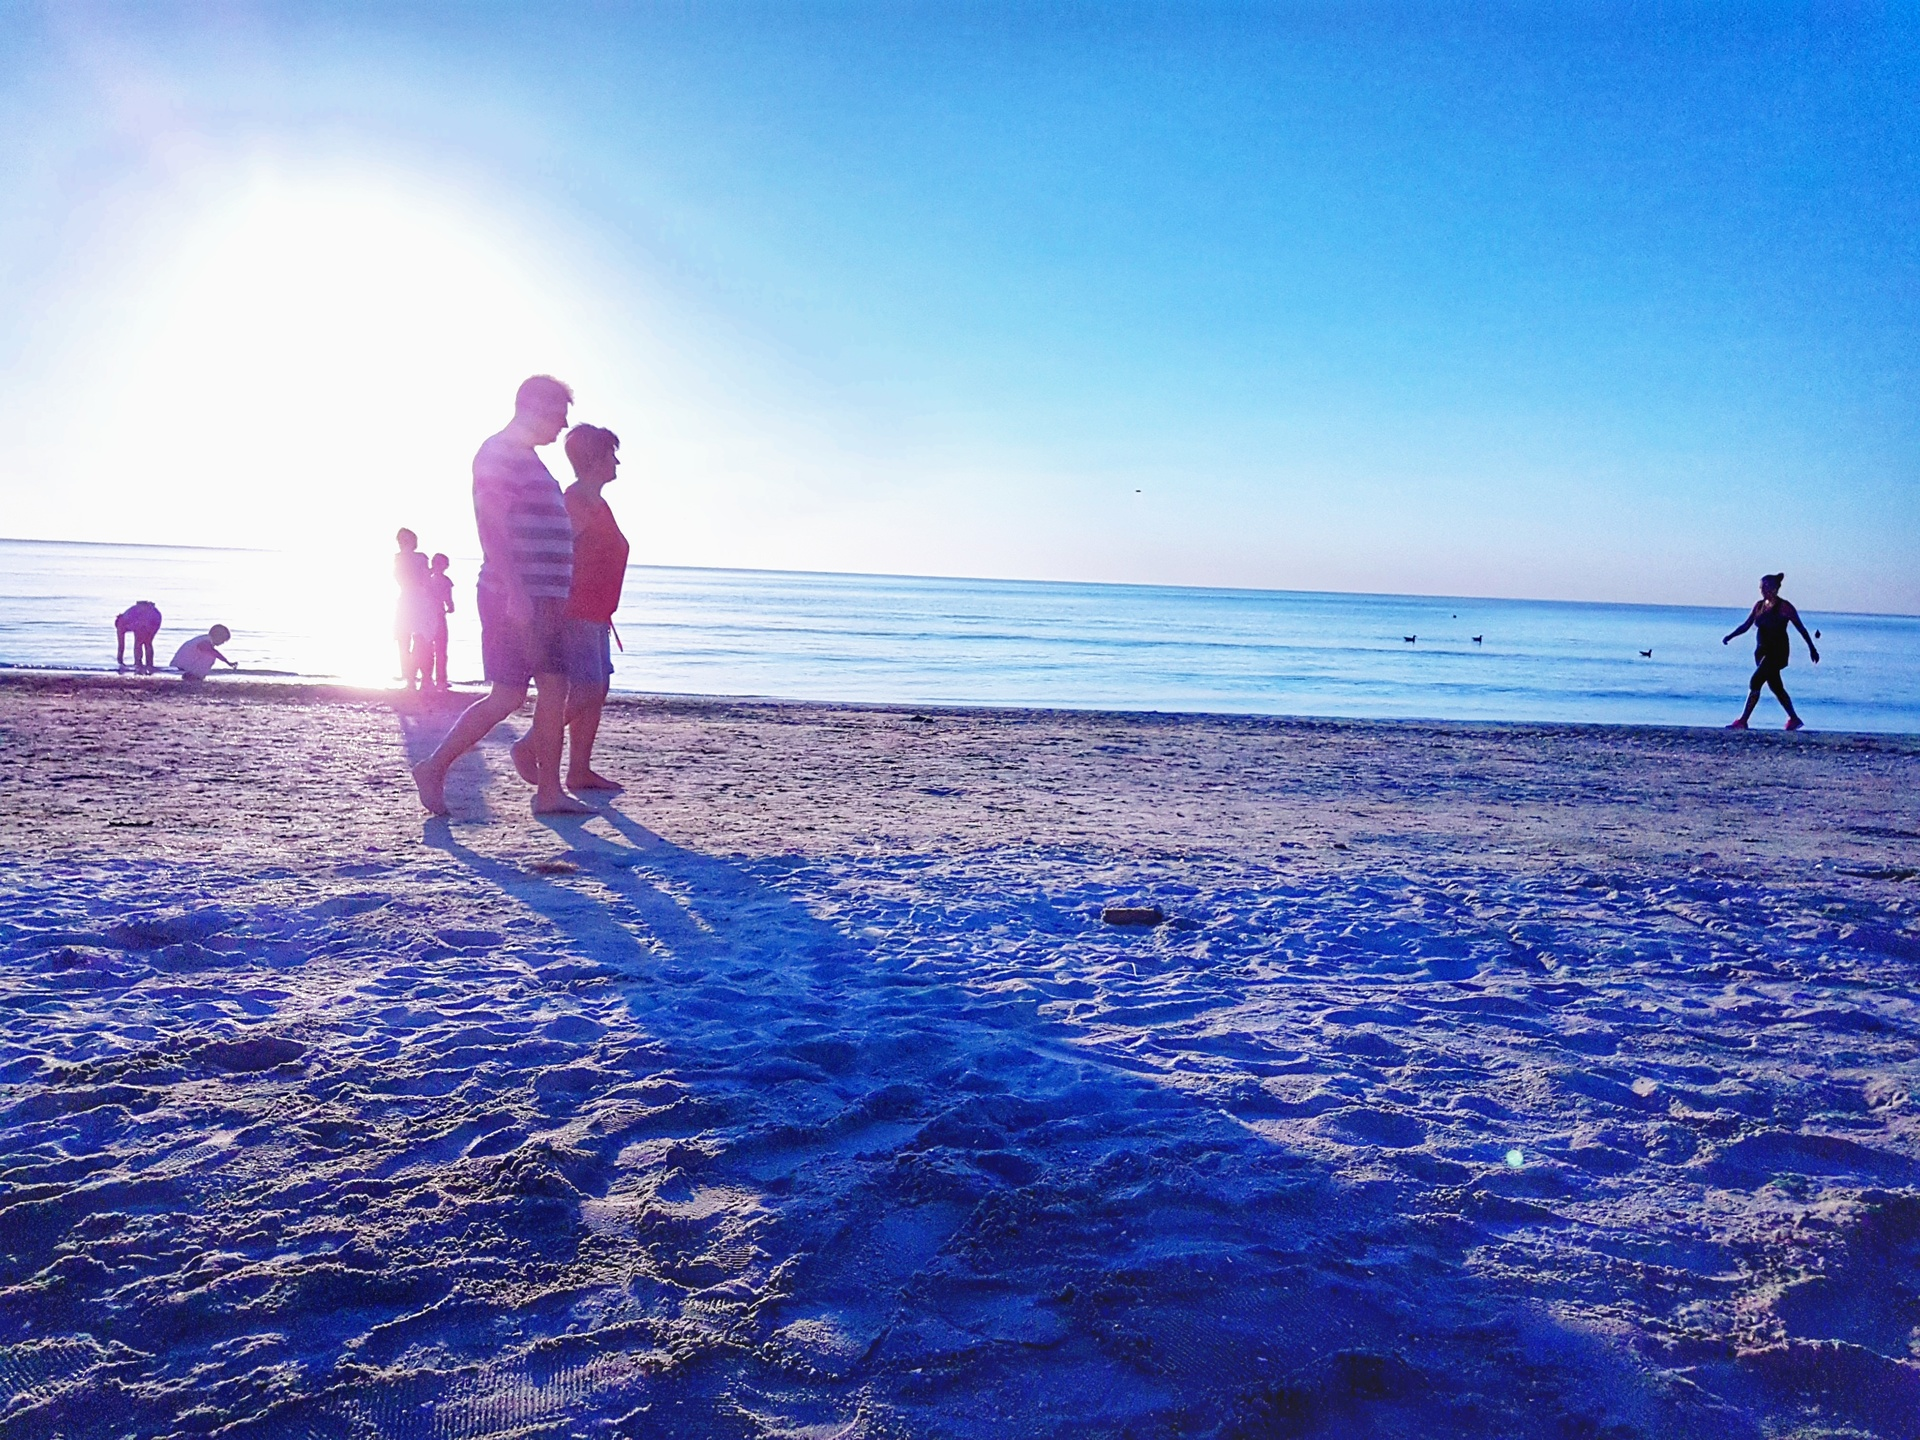 On the beach. | estraub, water, recreation, people